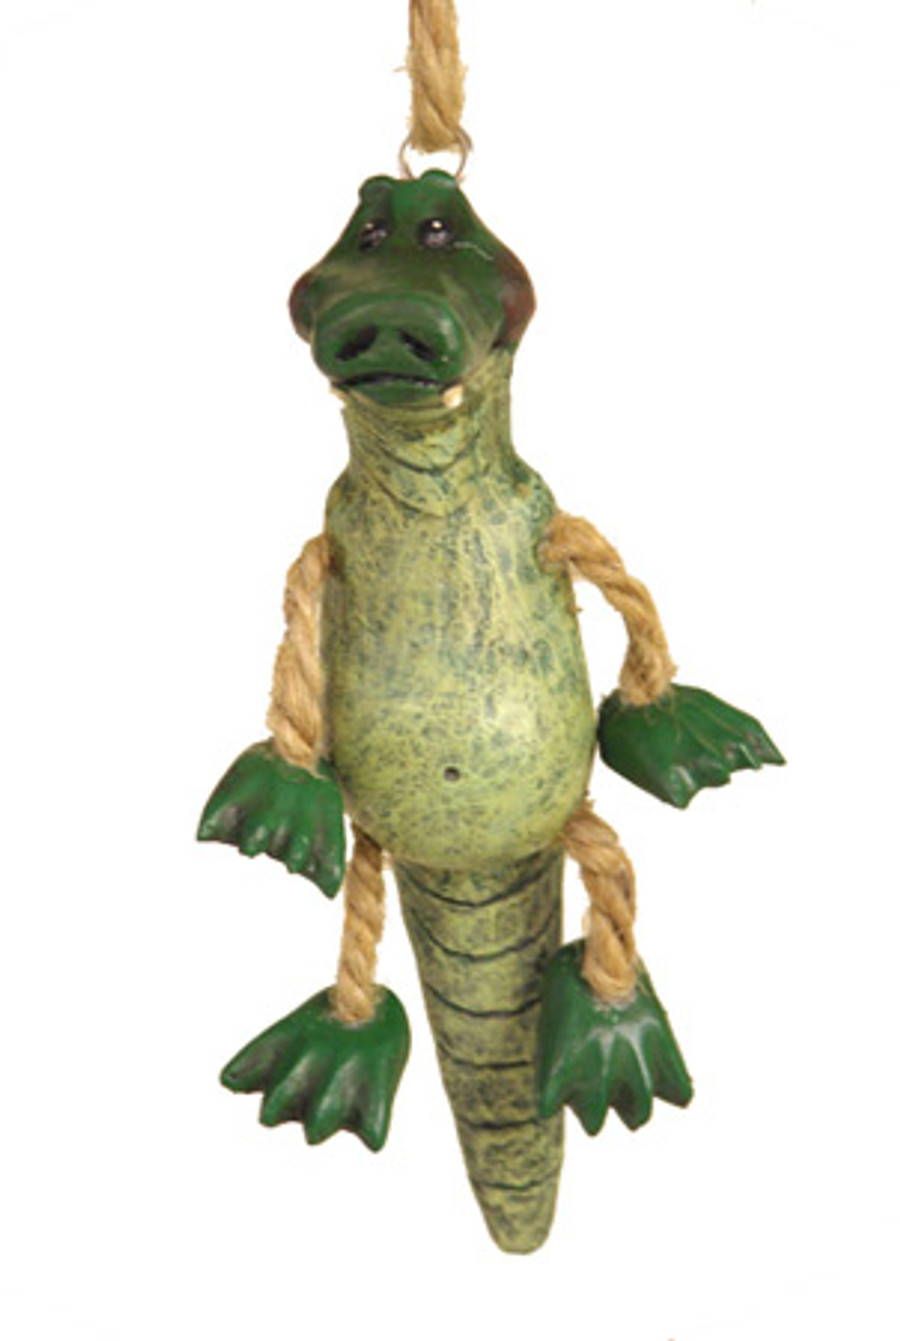 Alligator Ornament